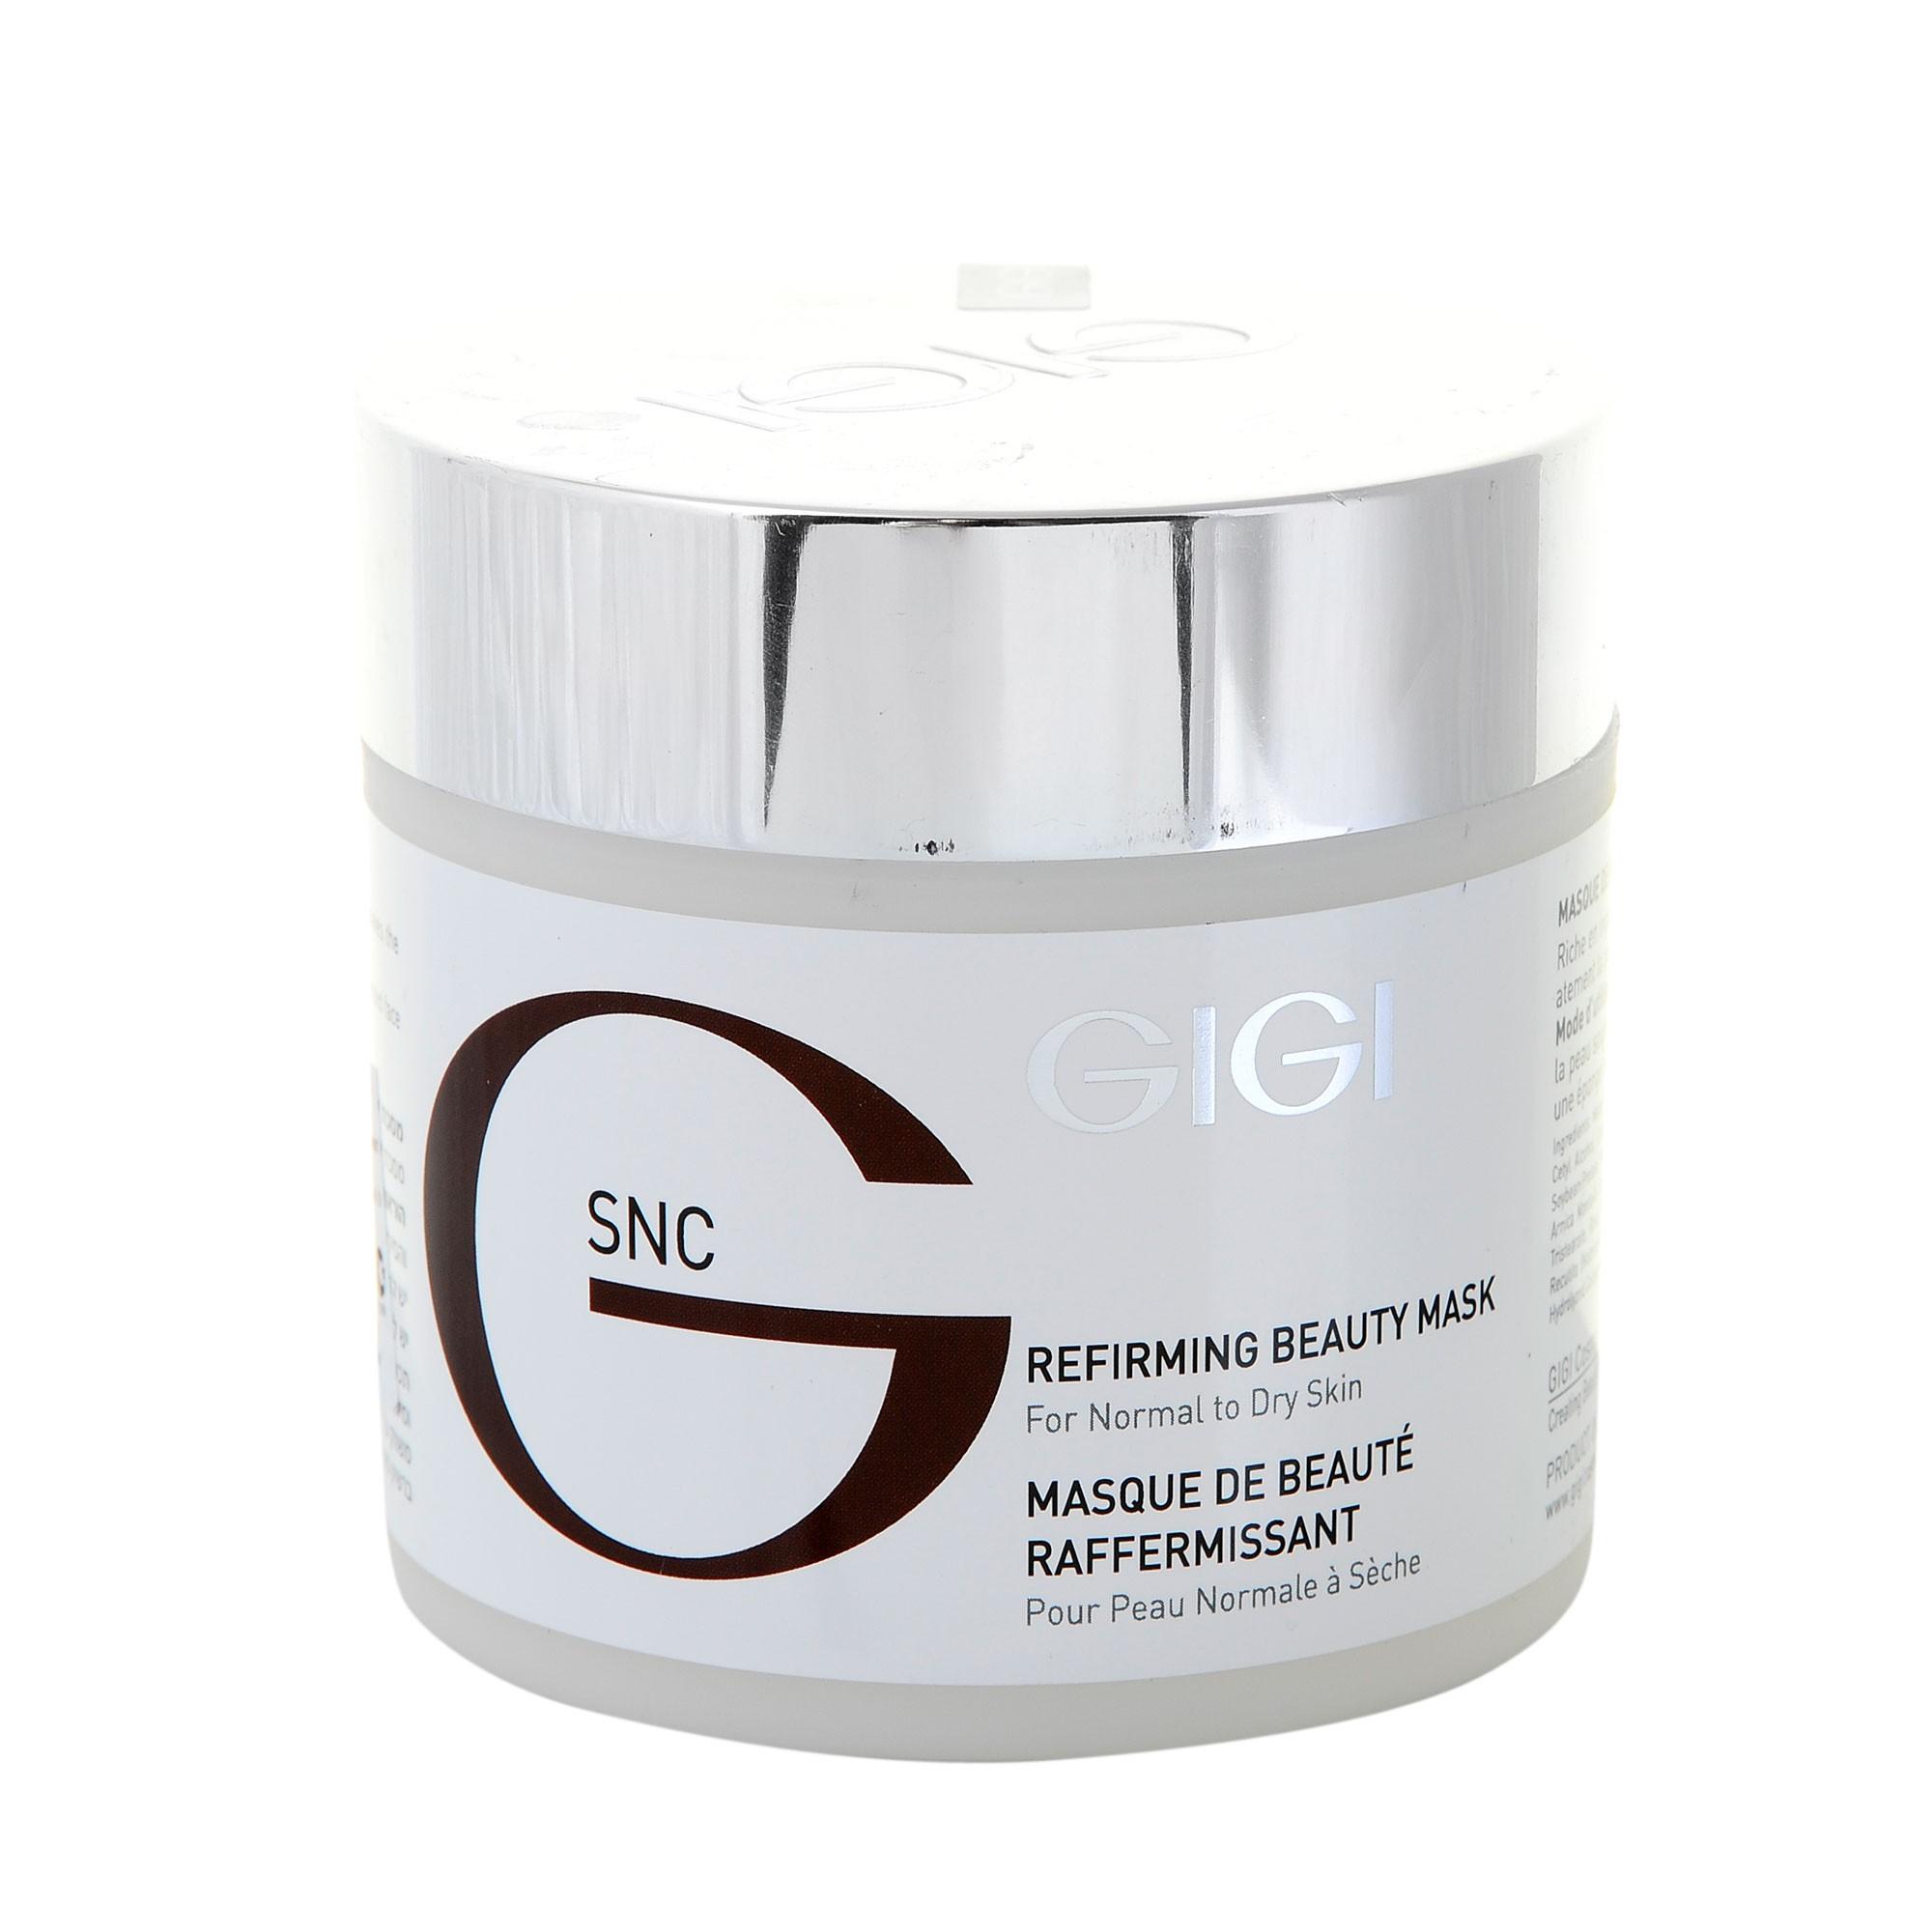 GIGI ����� ������� ����������� / Refirming Beauty Mask SNC 250��